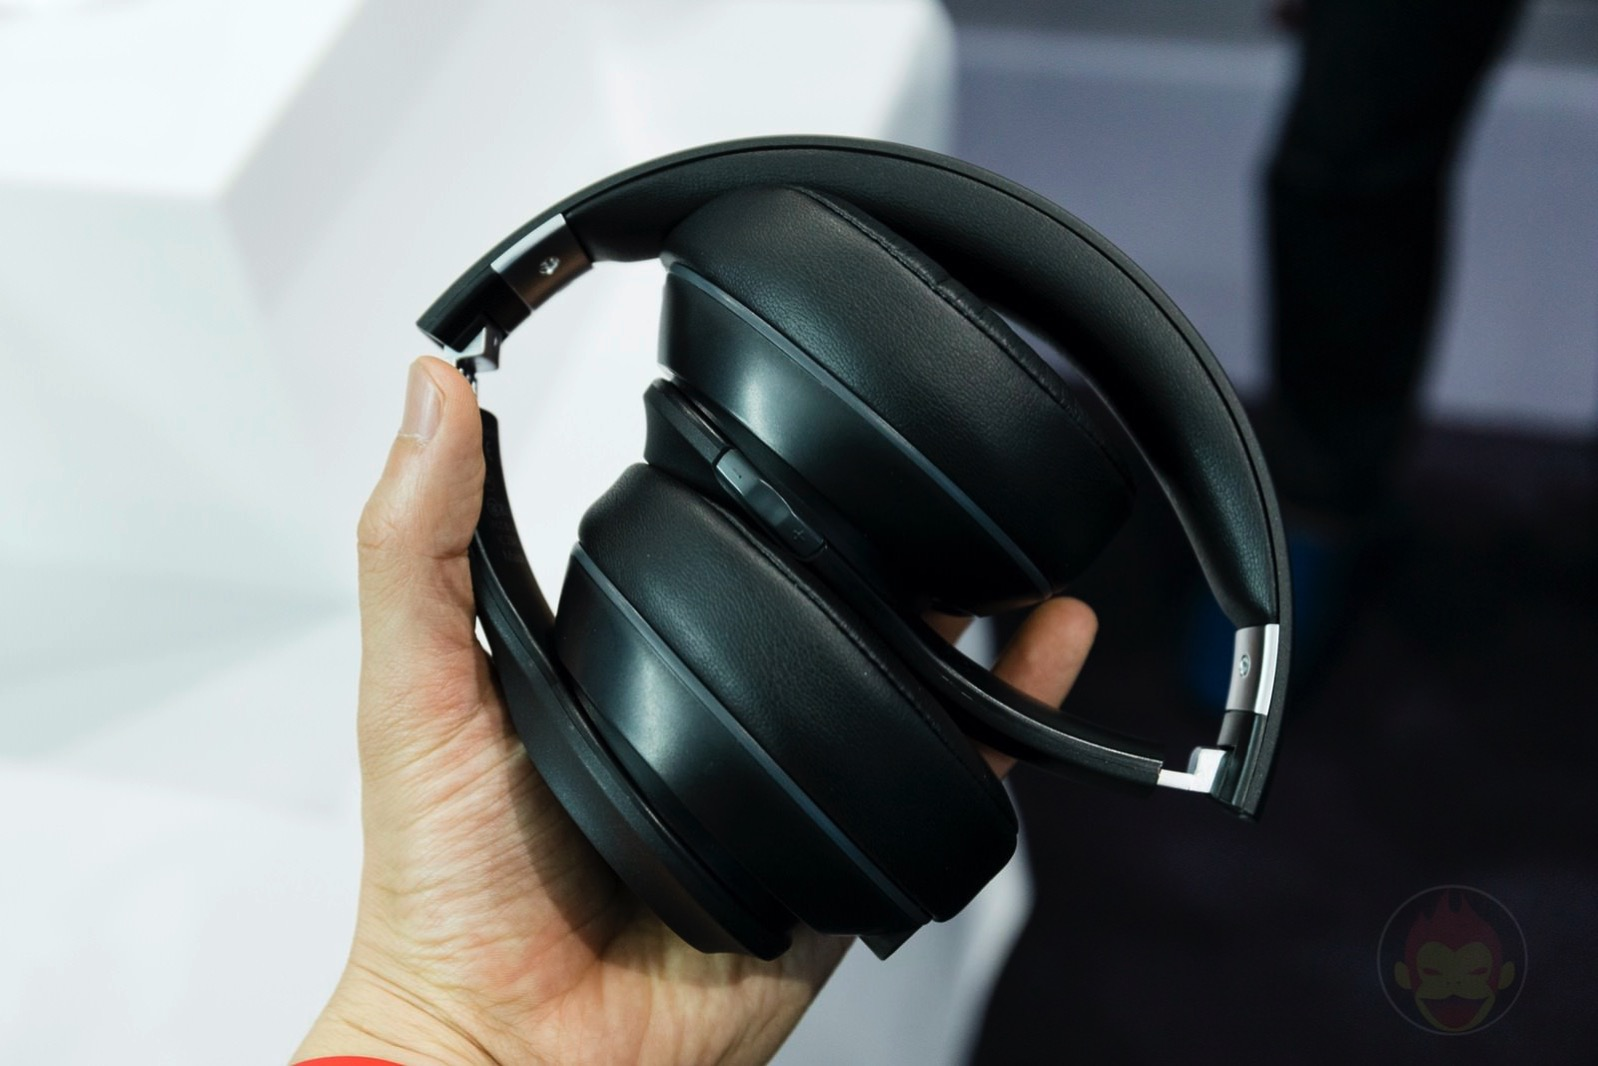 Anker-SoundCore-Vortex-06.jpg